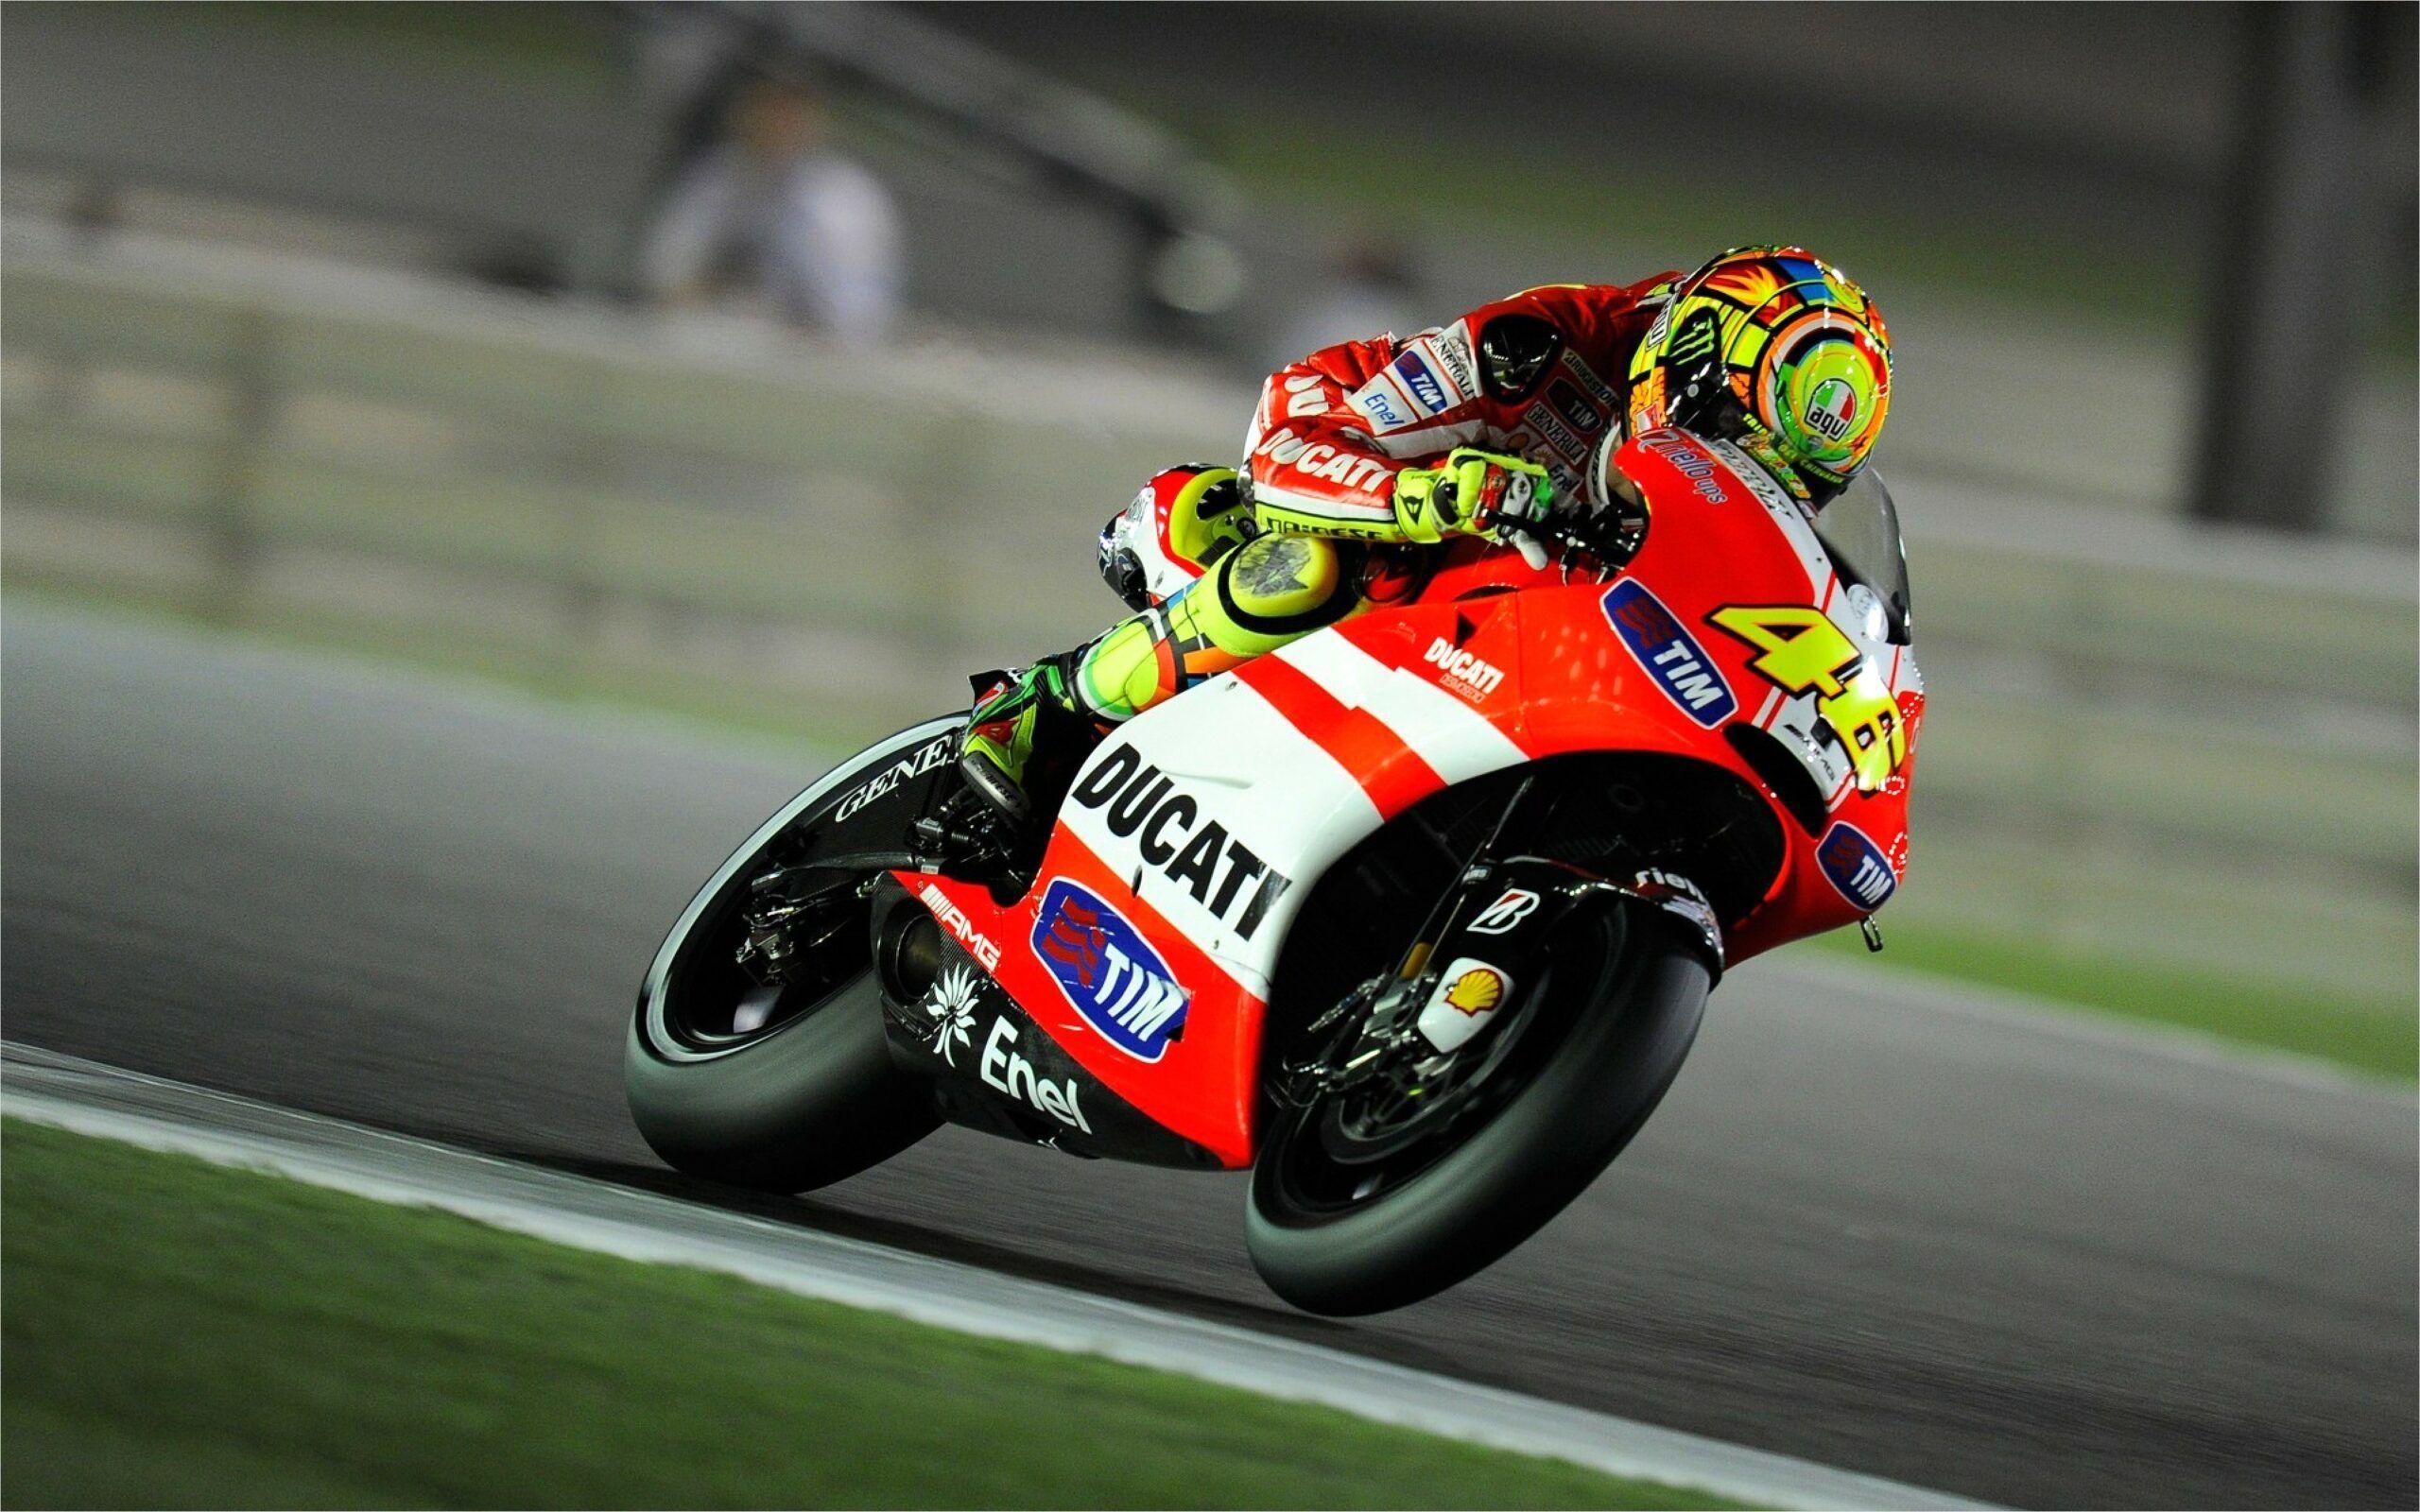 4k Moto Gp Wallpaper In 2020 Valentino Rossi Ducati Motogp